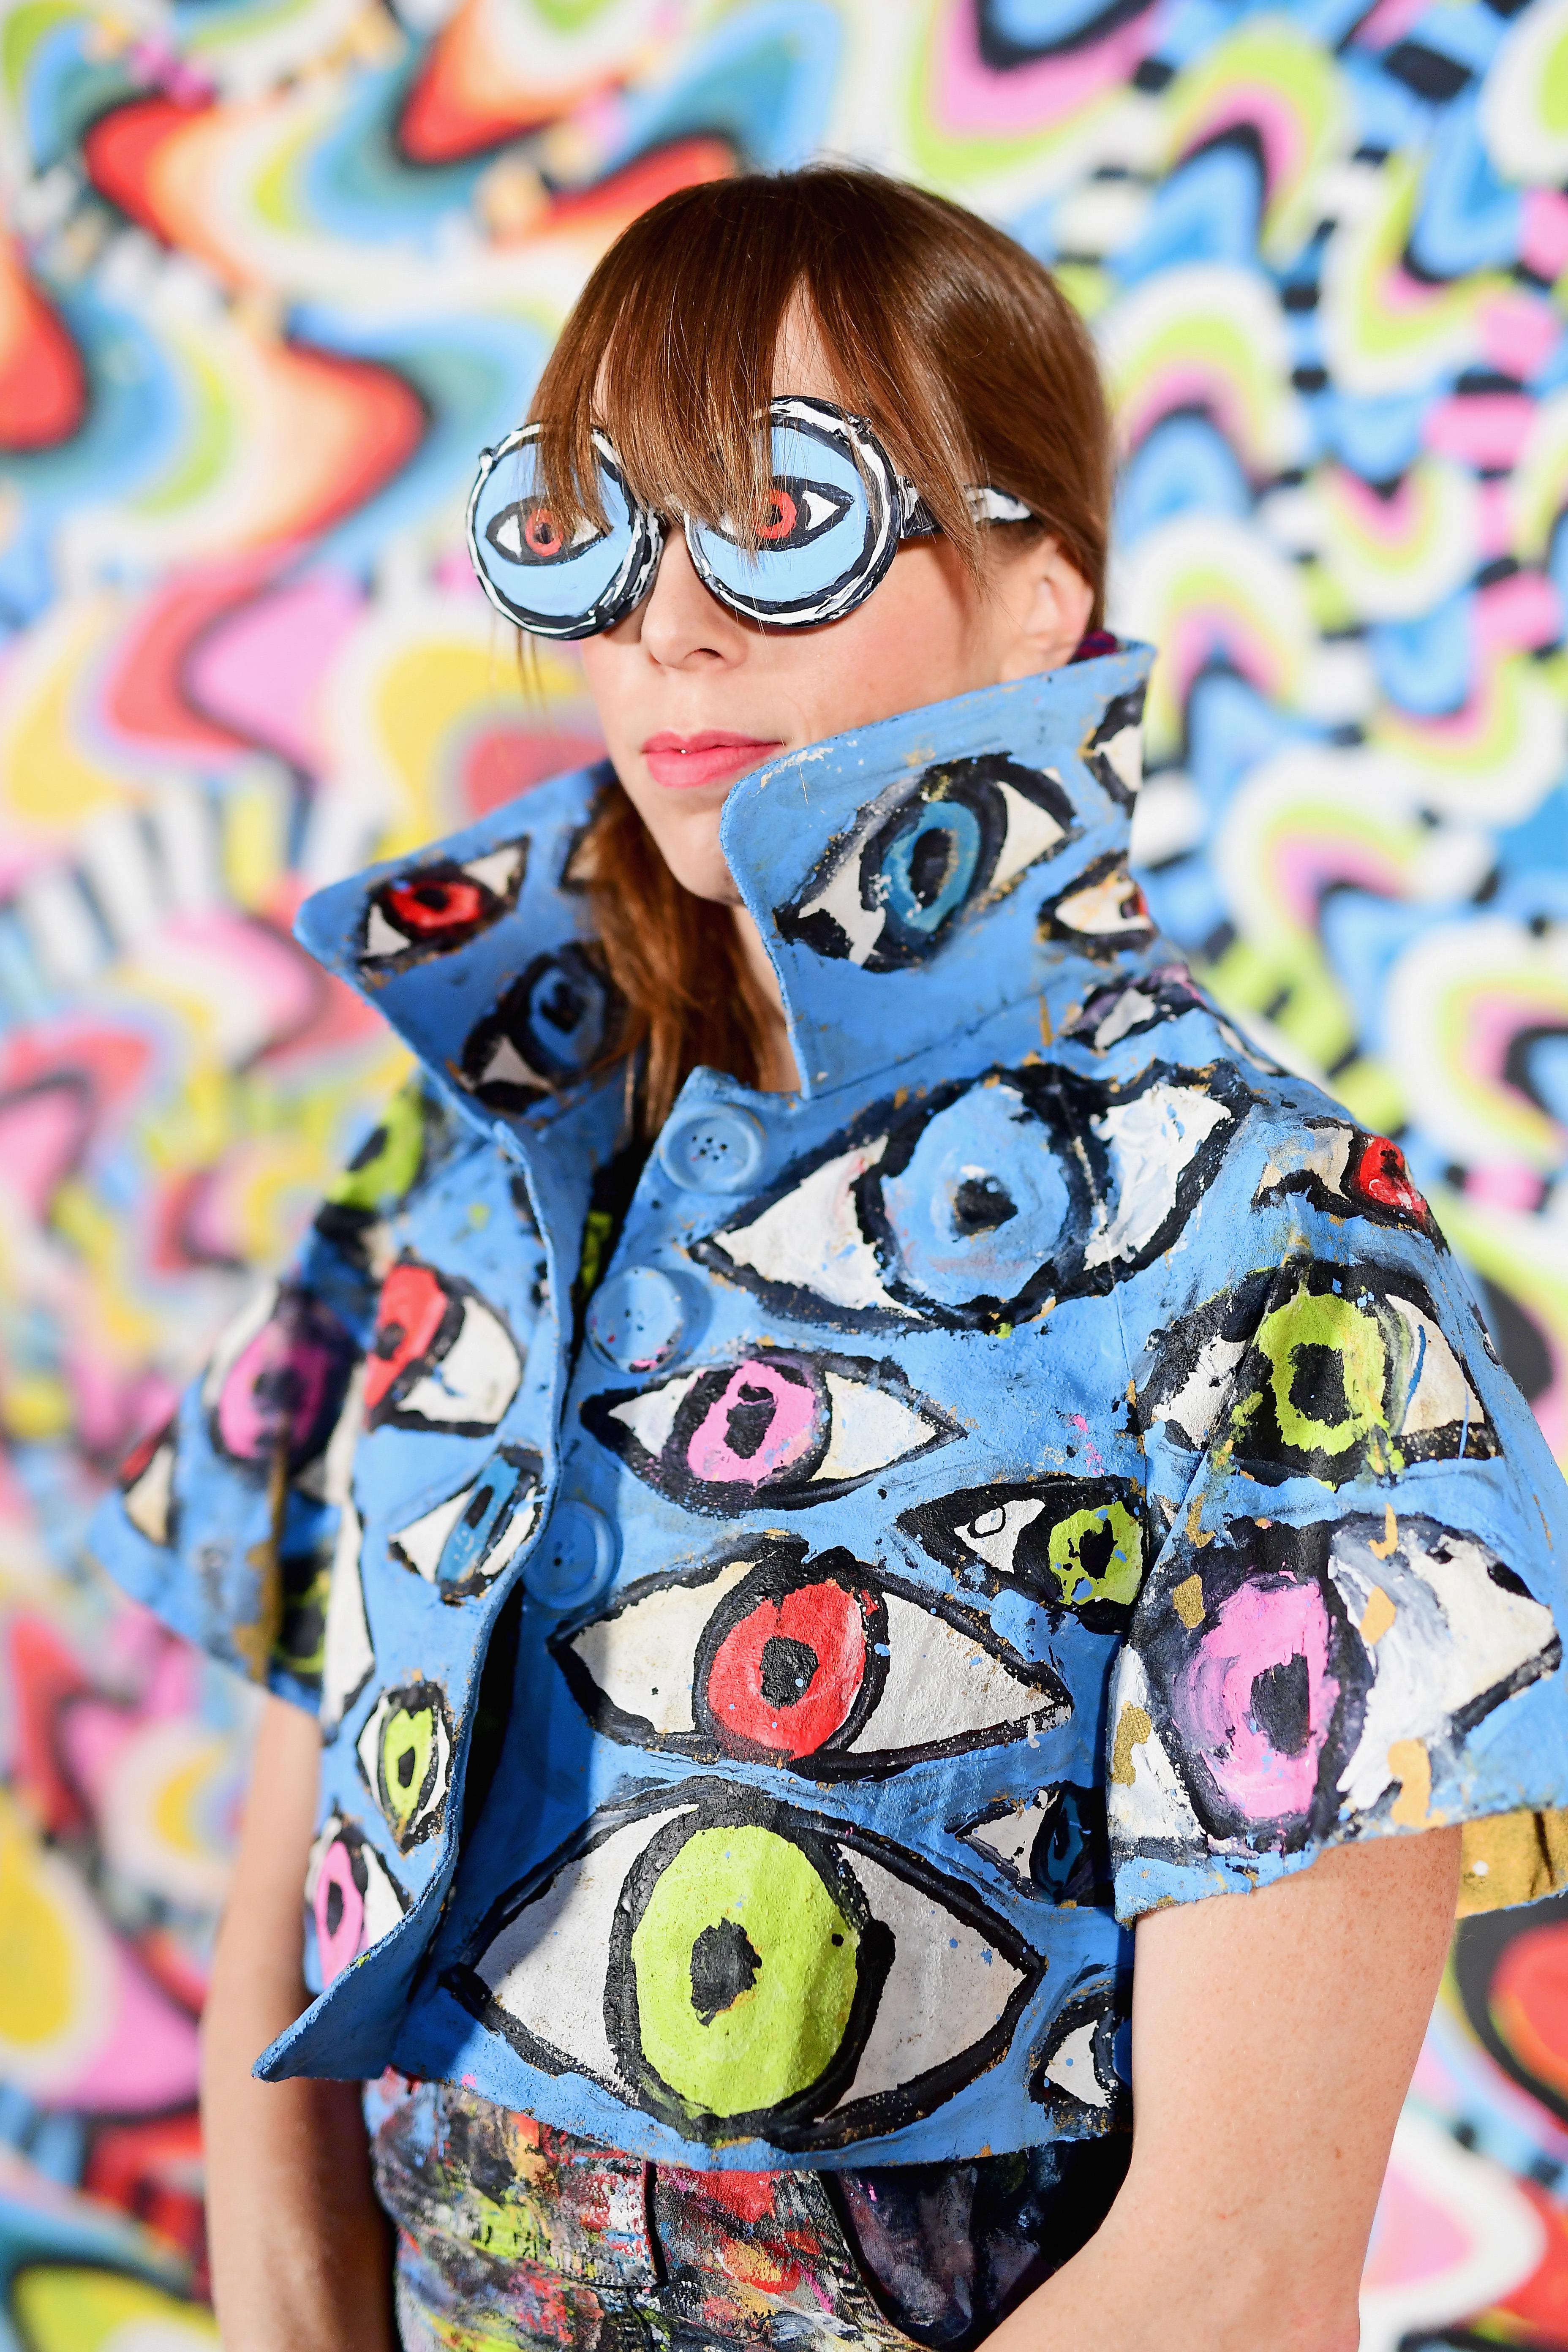 29Rooms Makes Its West Coast Debut by Amanda Vandenberg